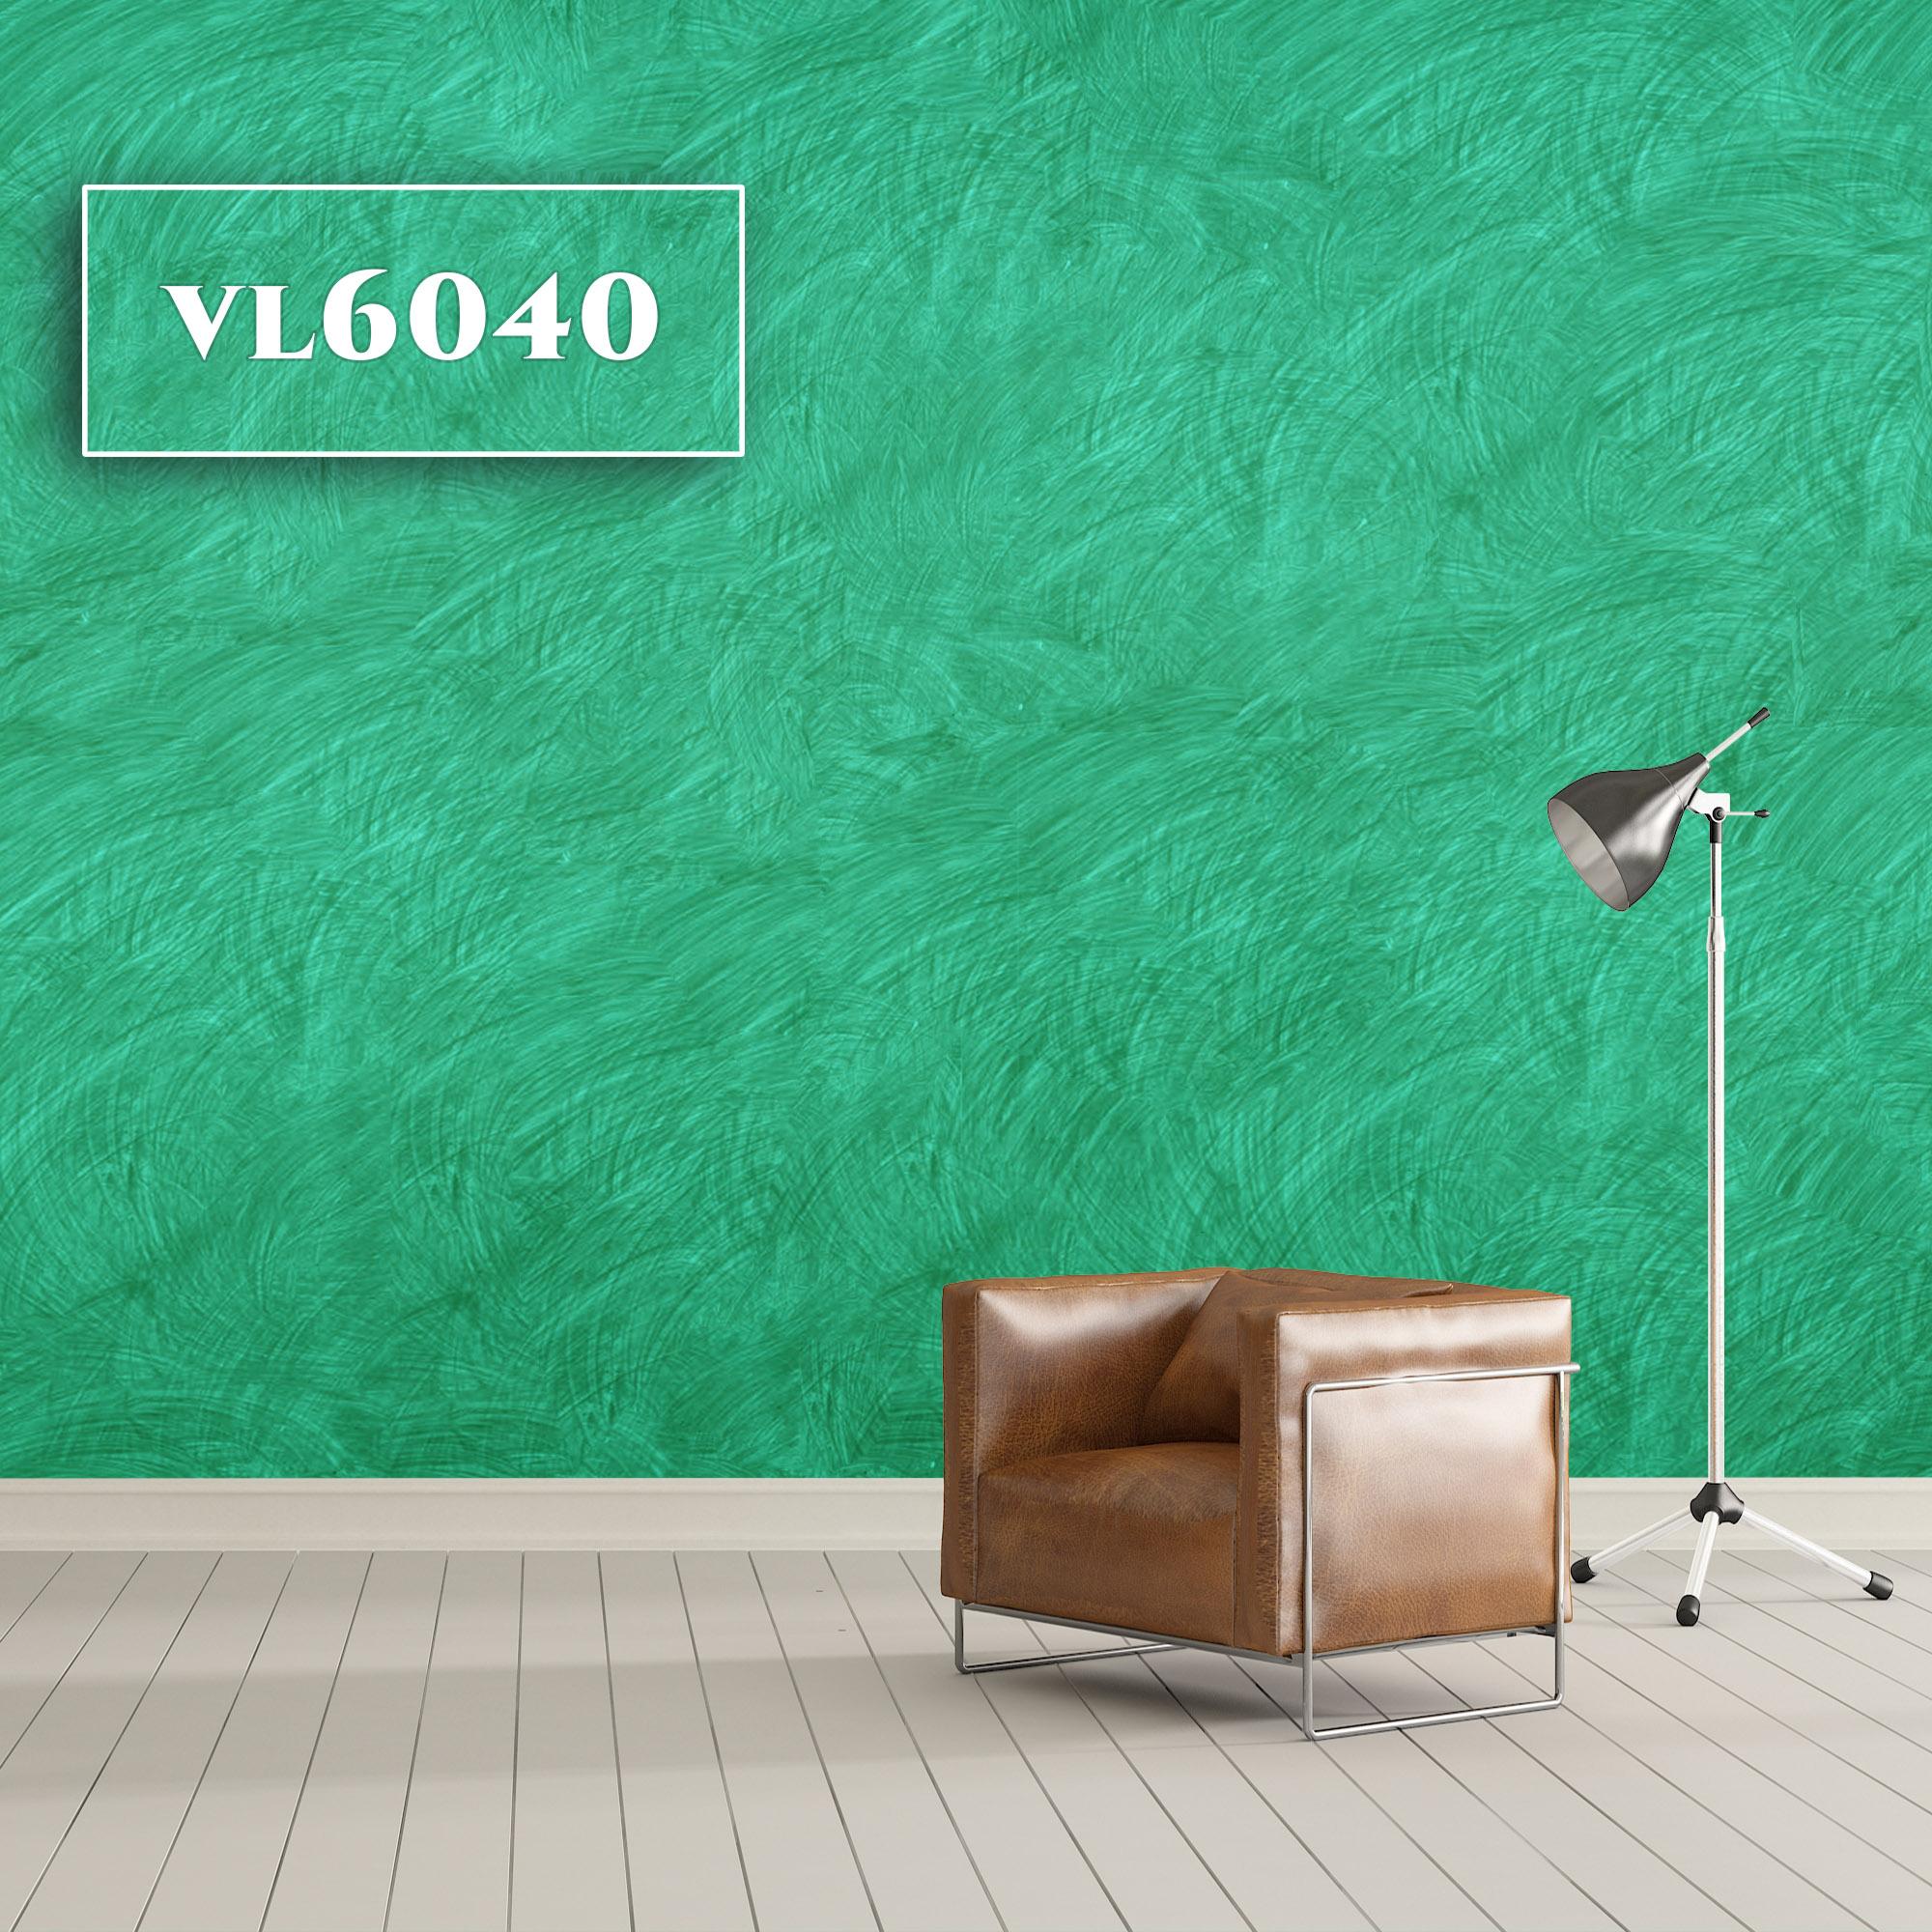 VL6040